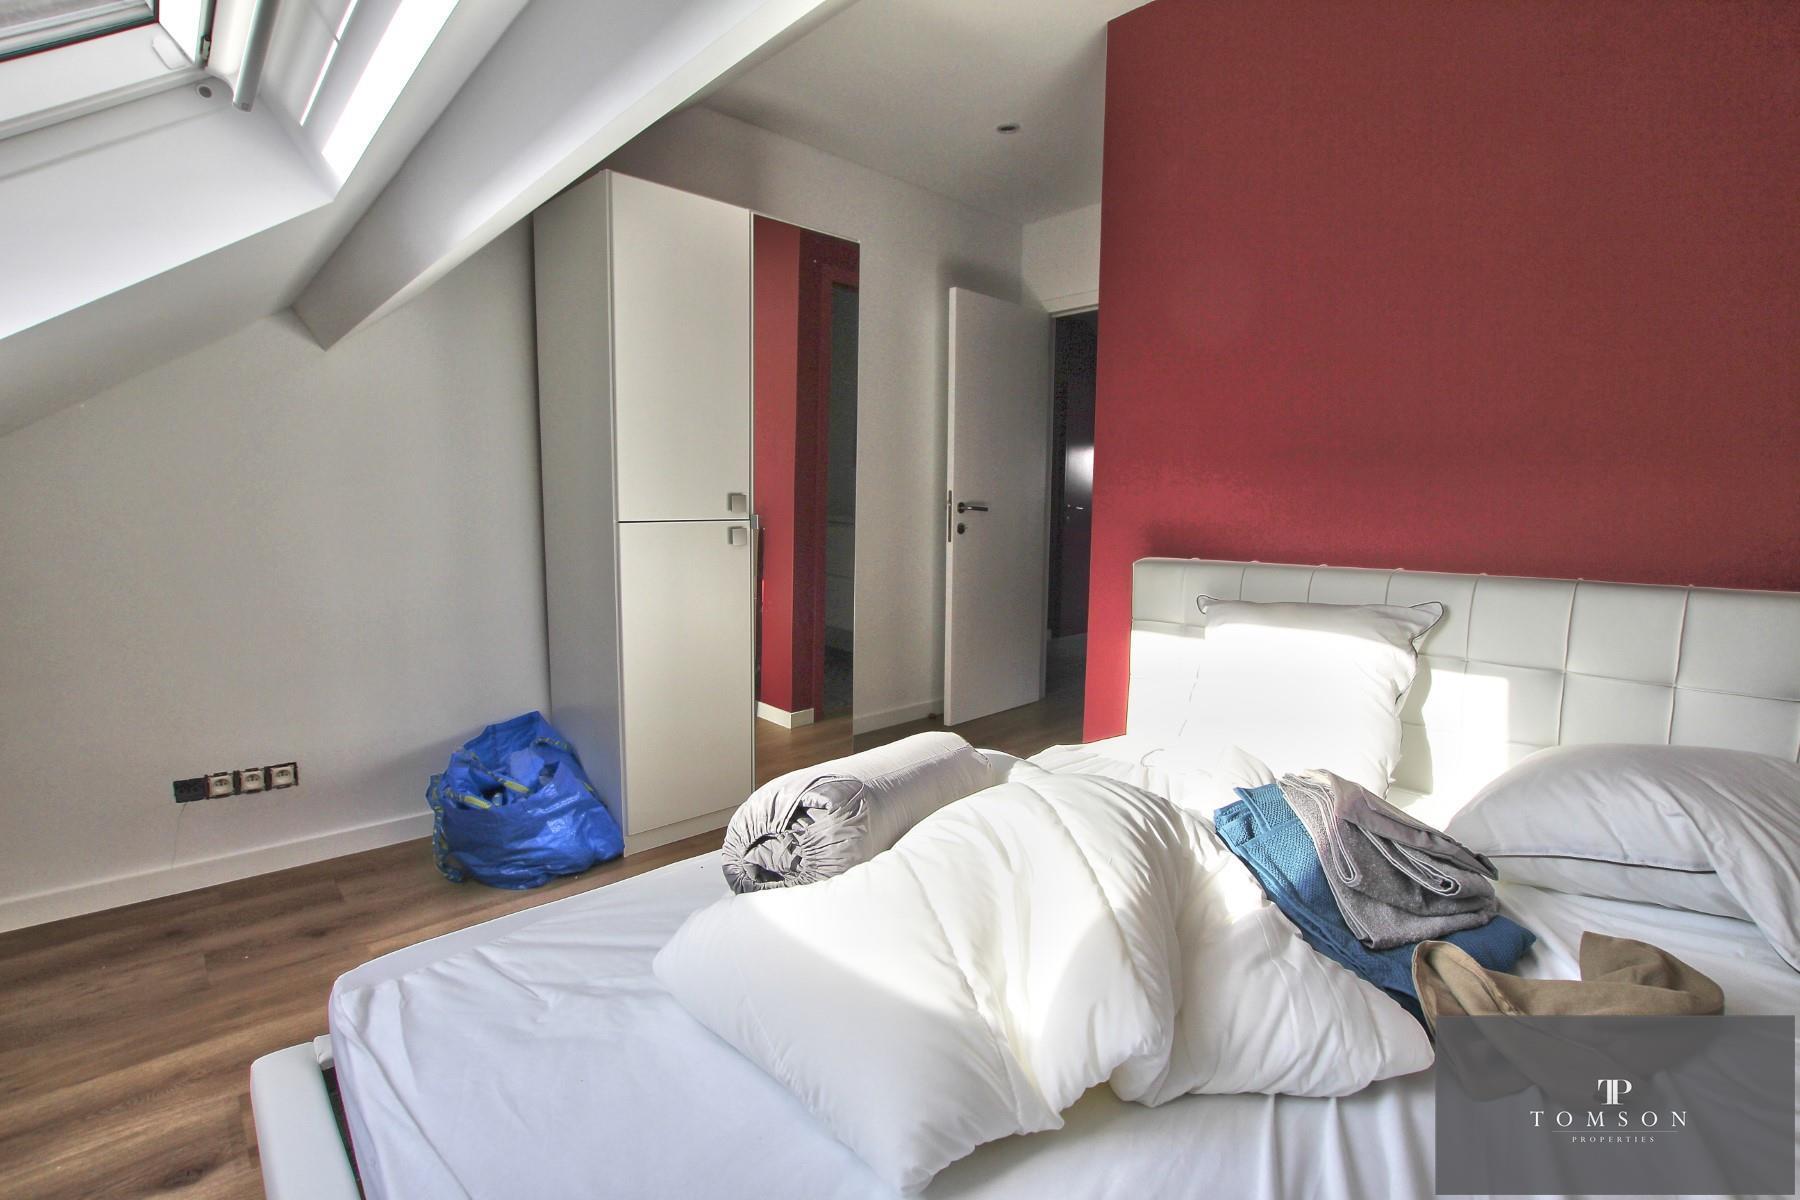 Flat - Etterbeek - #4328604-3